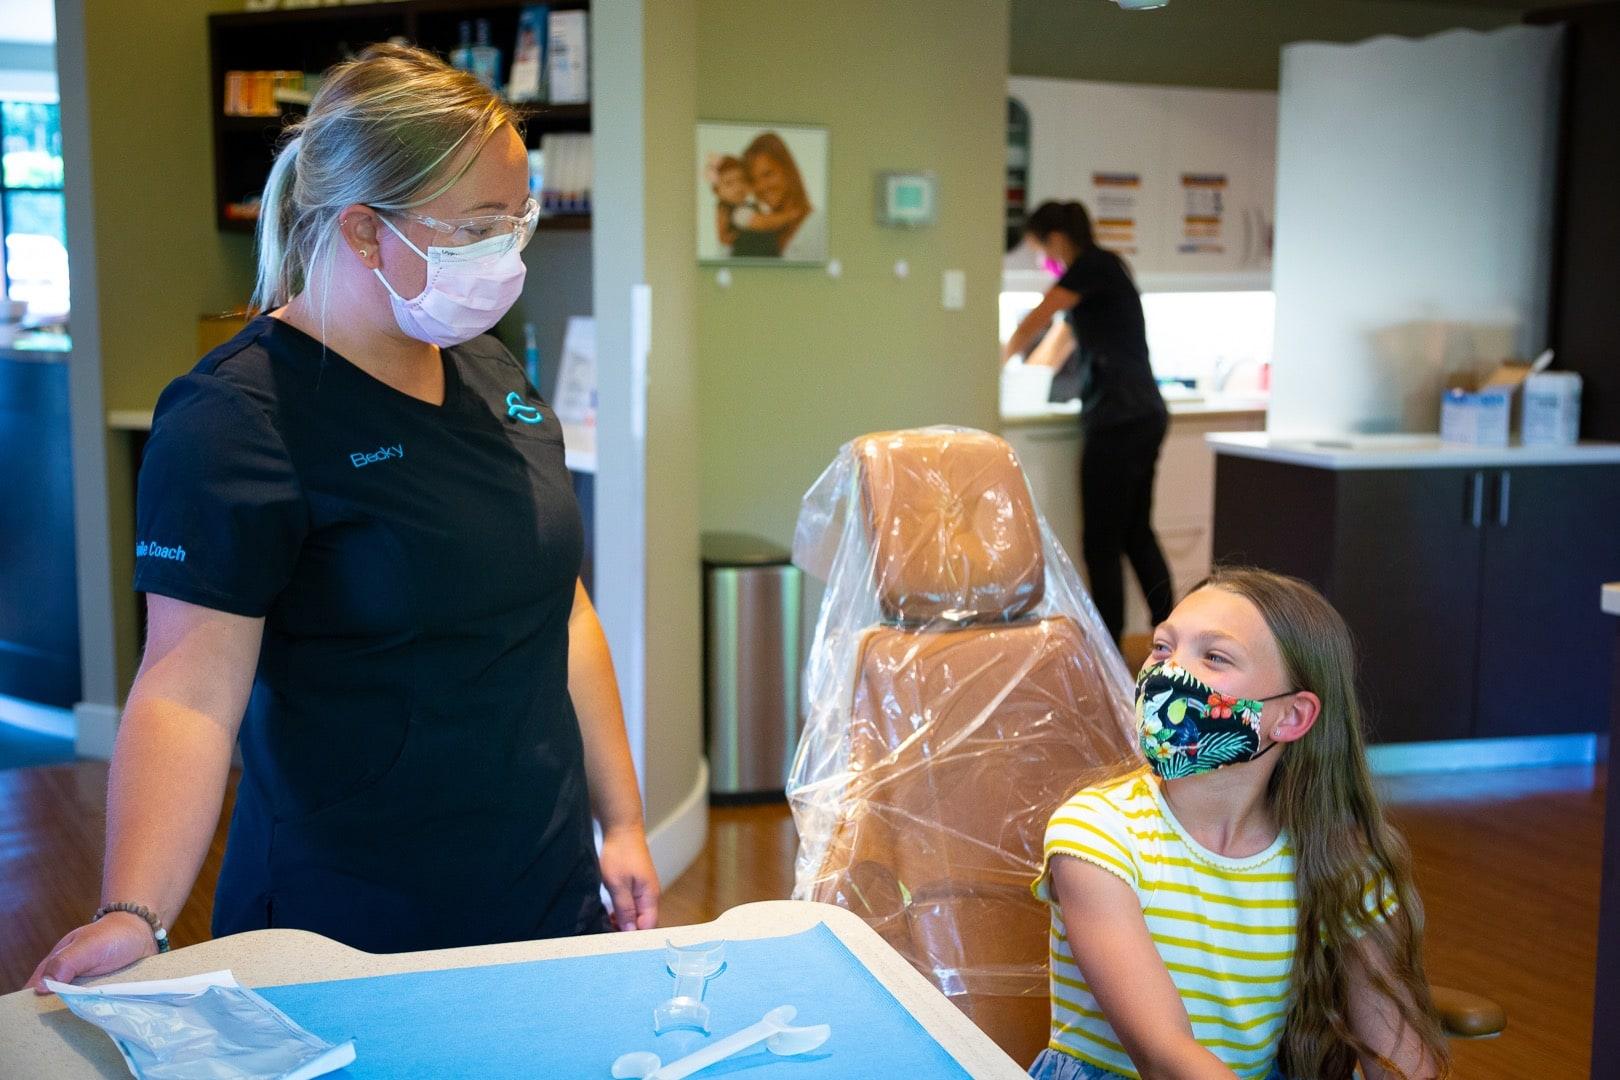 Staff Candids Oceans Edge Orthodontics 2020 Nanaimo Canada Orthodontist 94 - What Sets Us Apart